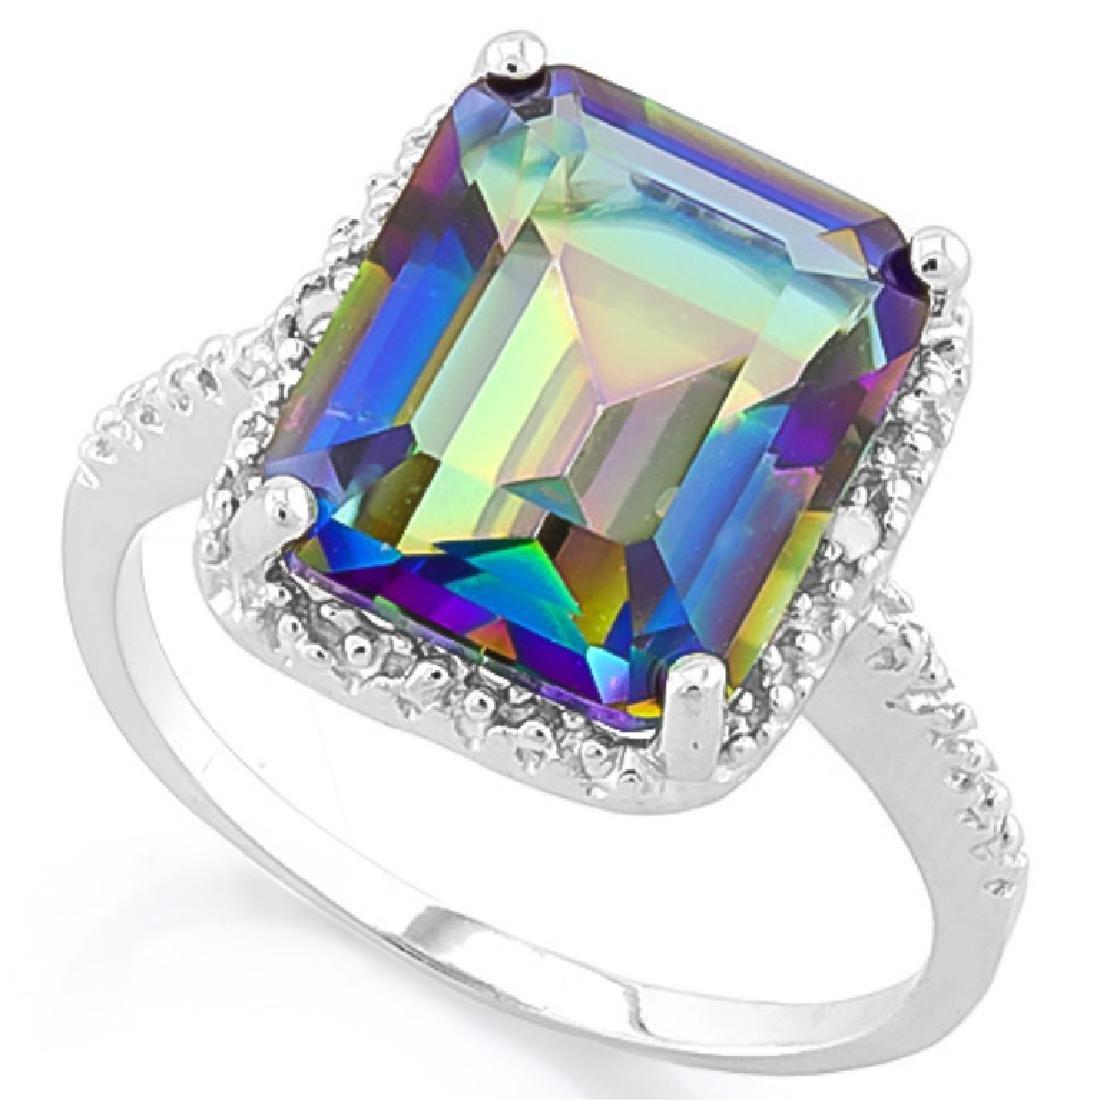 HUGE 5CT EMERALD CUT MYSTIC TOPAZ/DIAMOND RING